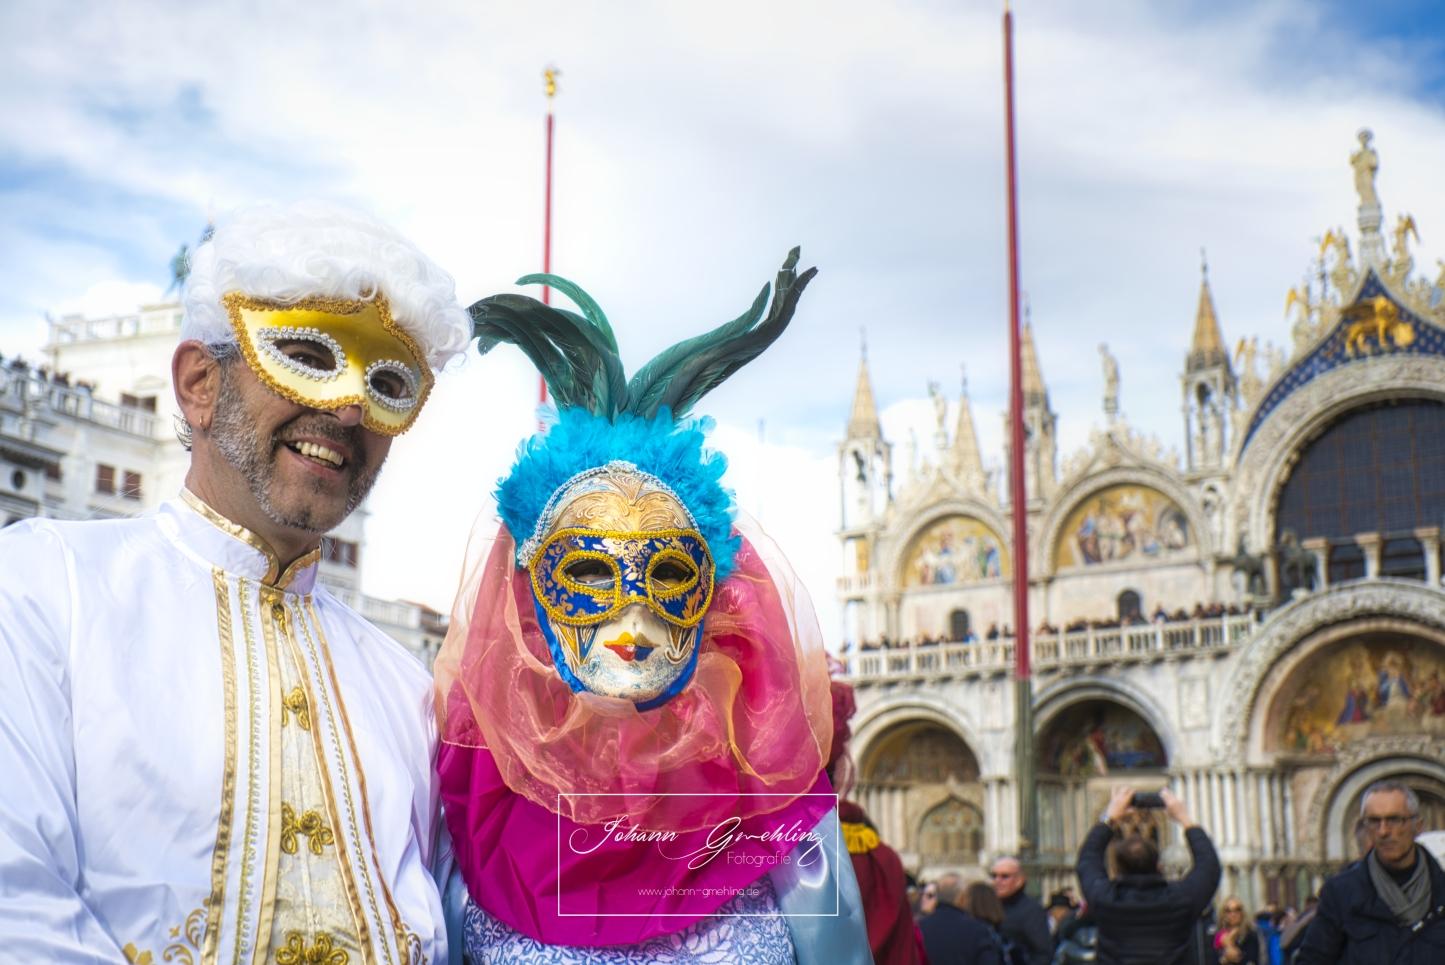 Bunte Maske in Venedig am Markusplatz